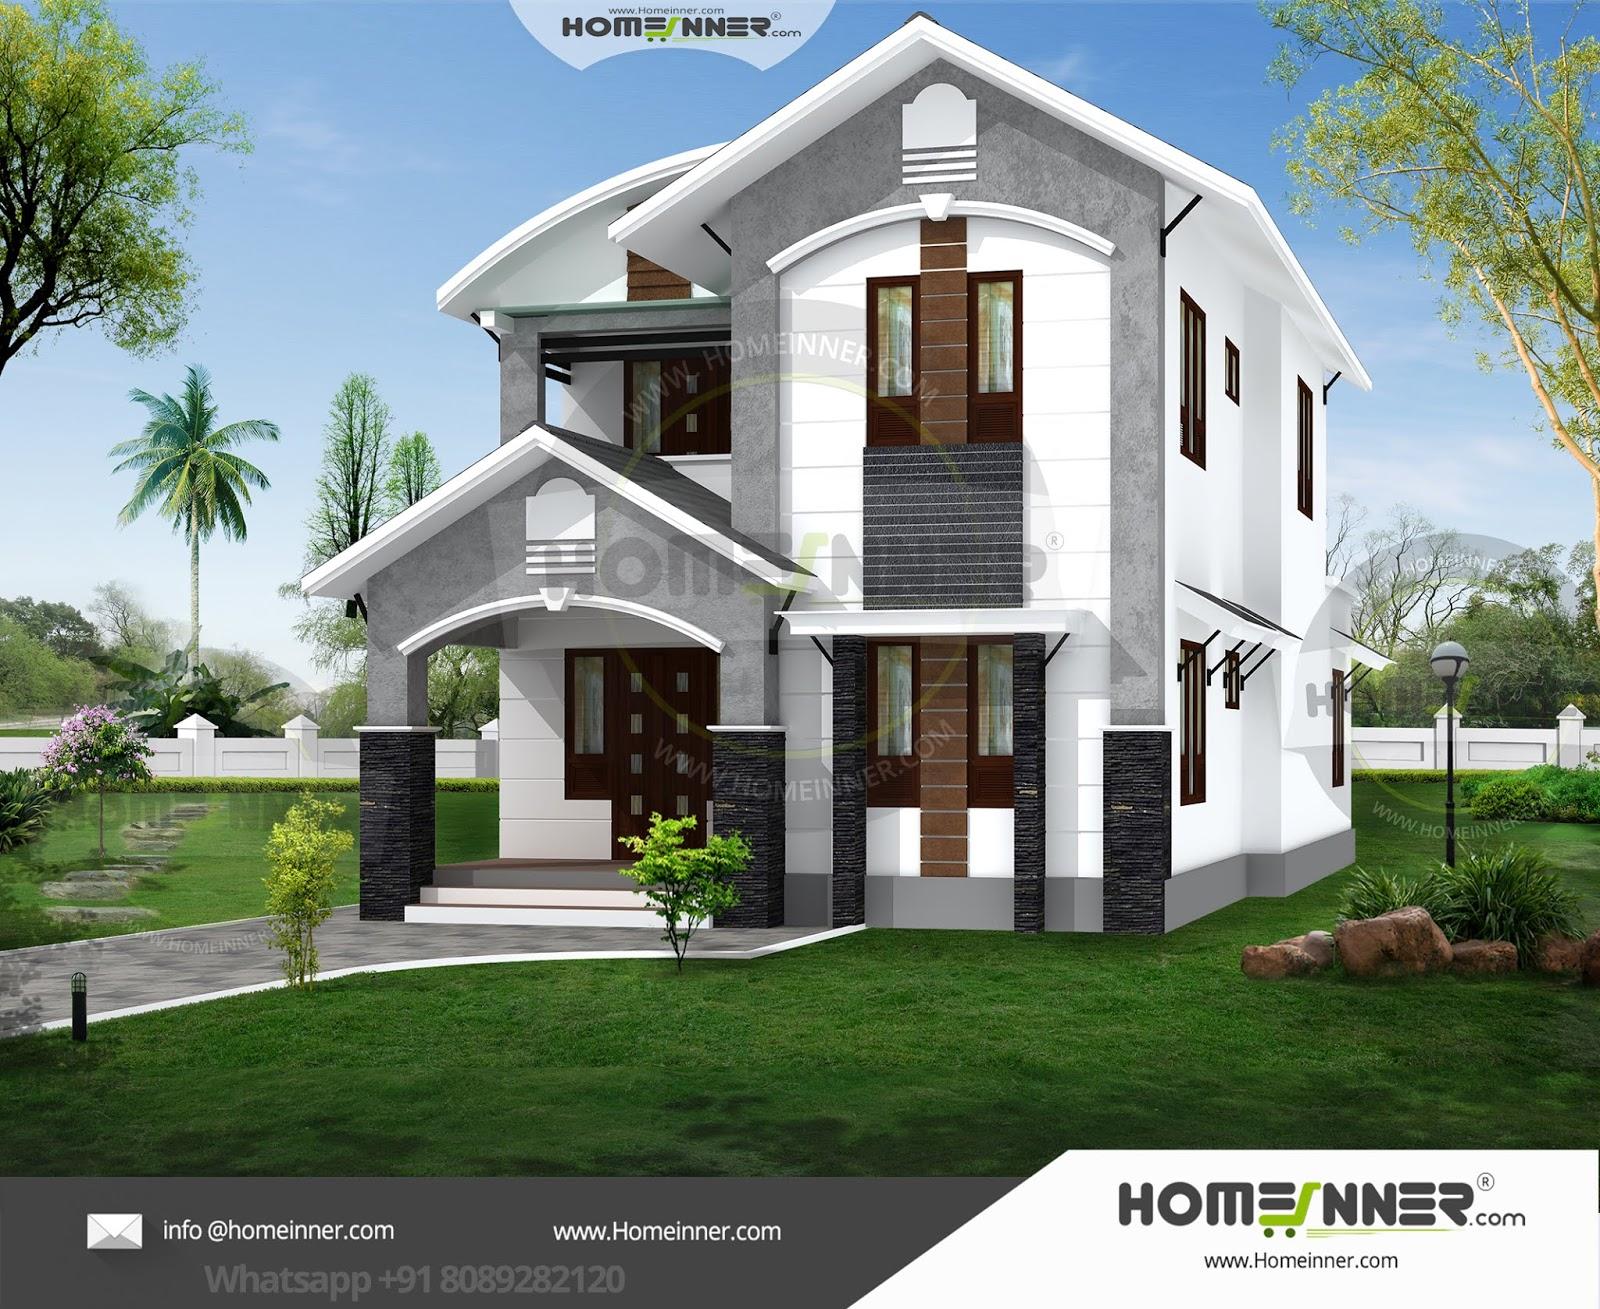 23 Lakh 4 BHK 1625 sq ft Mangalore Villa